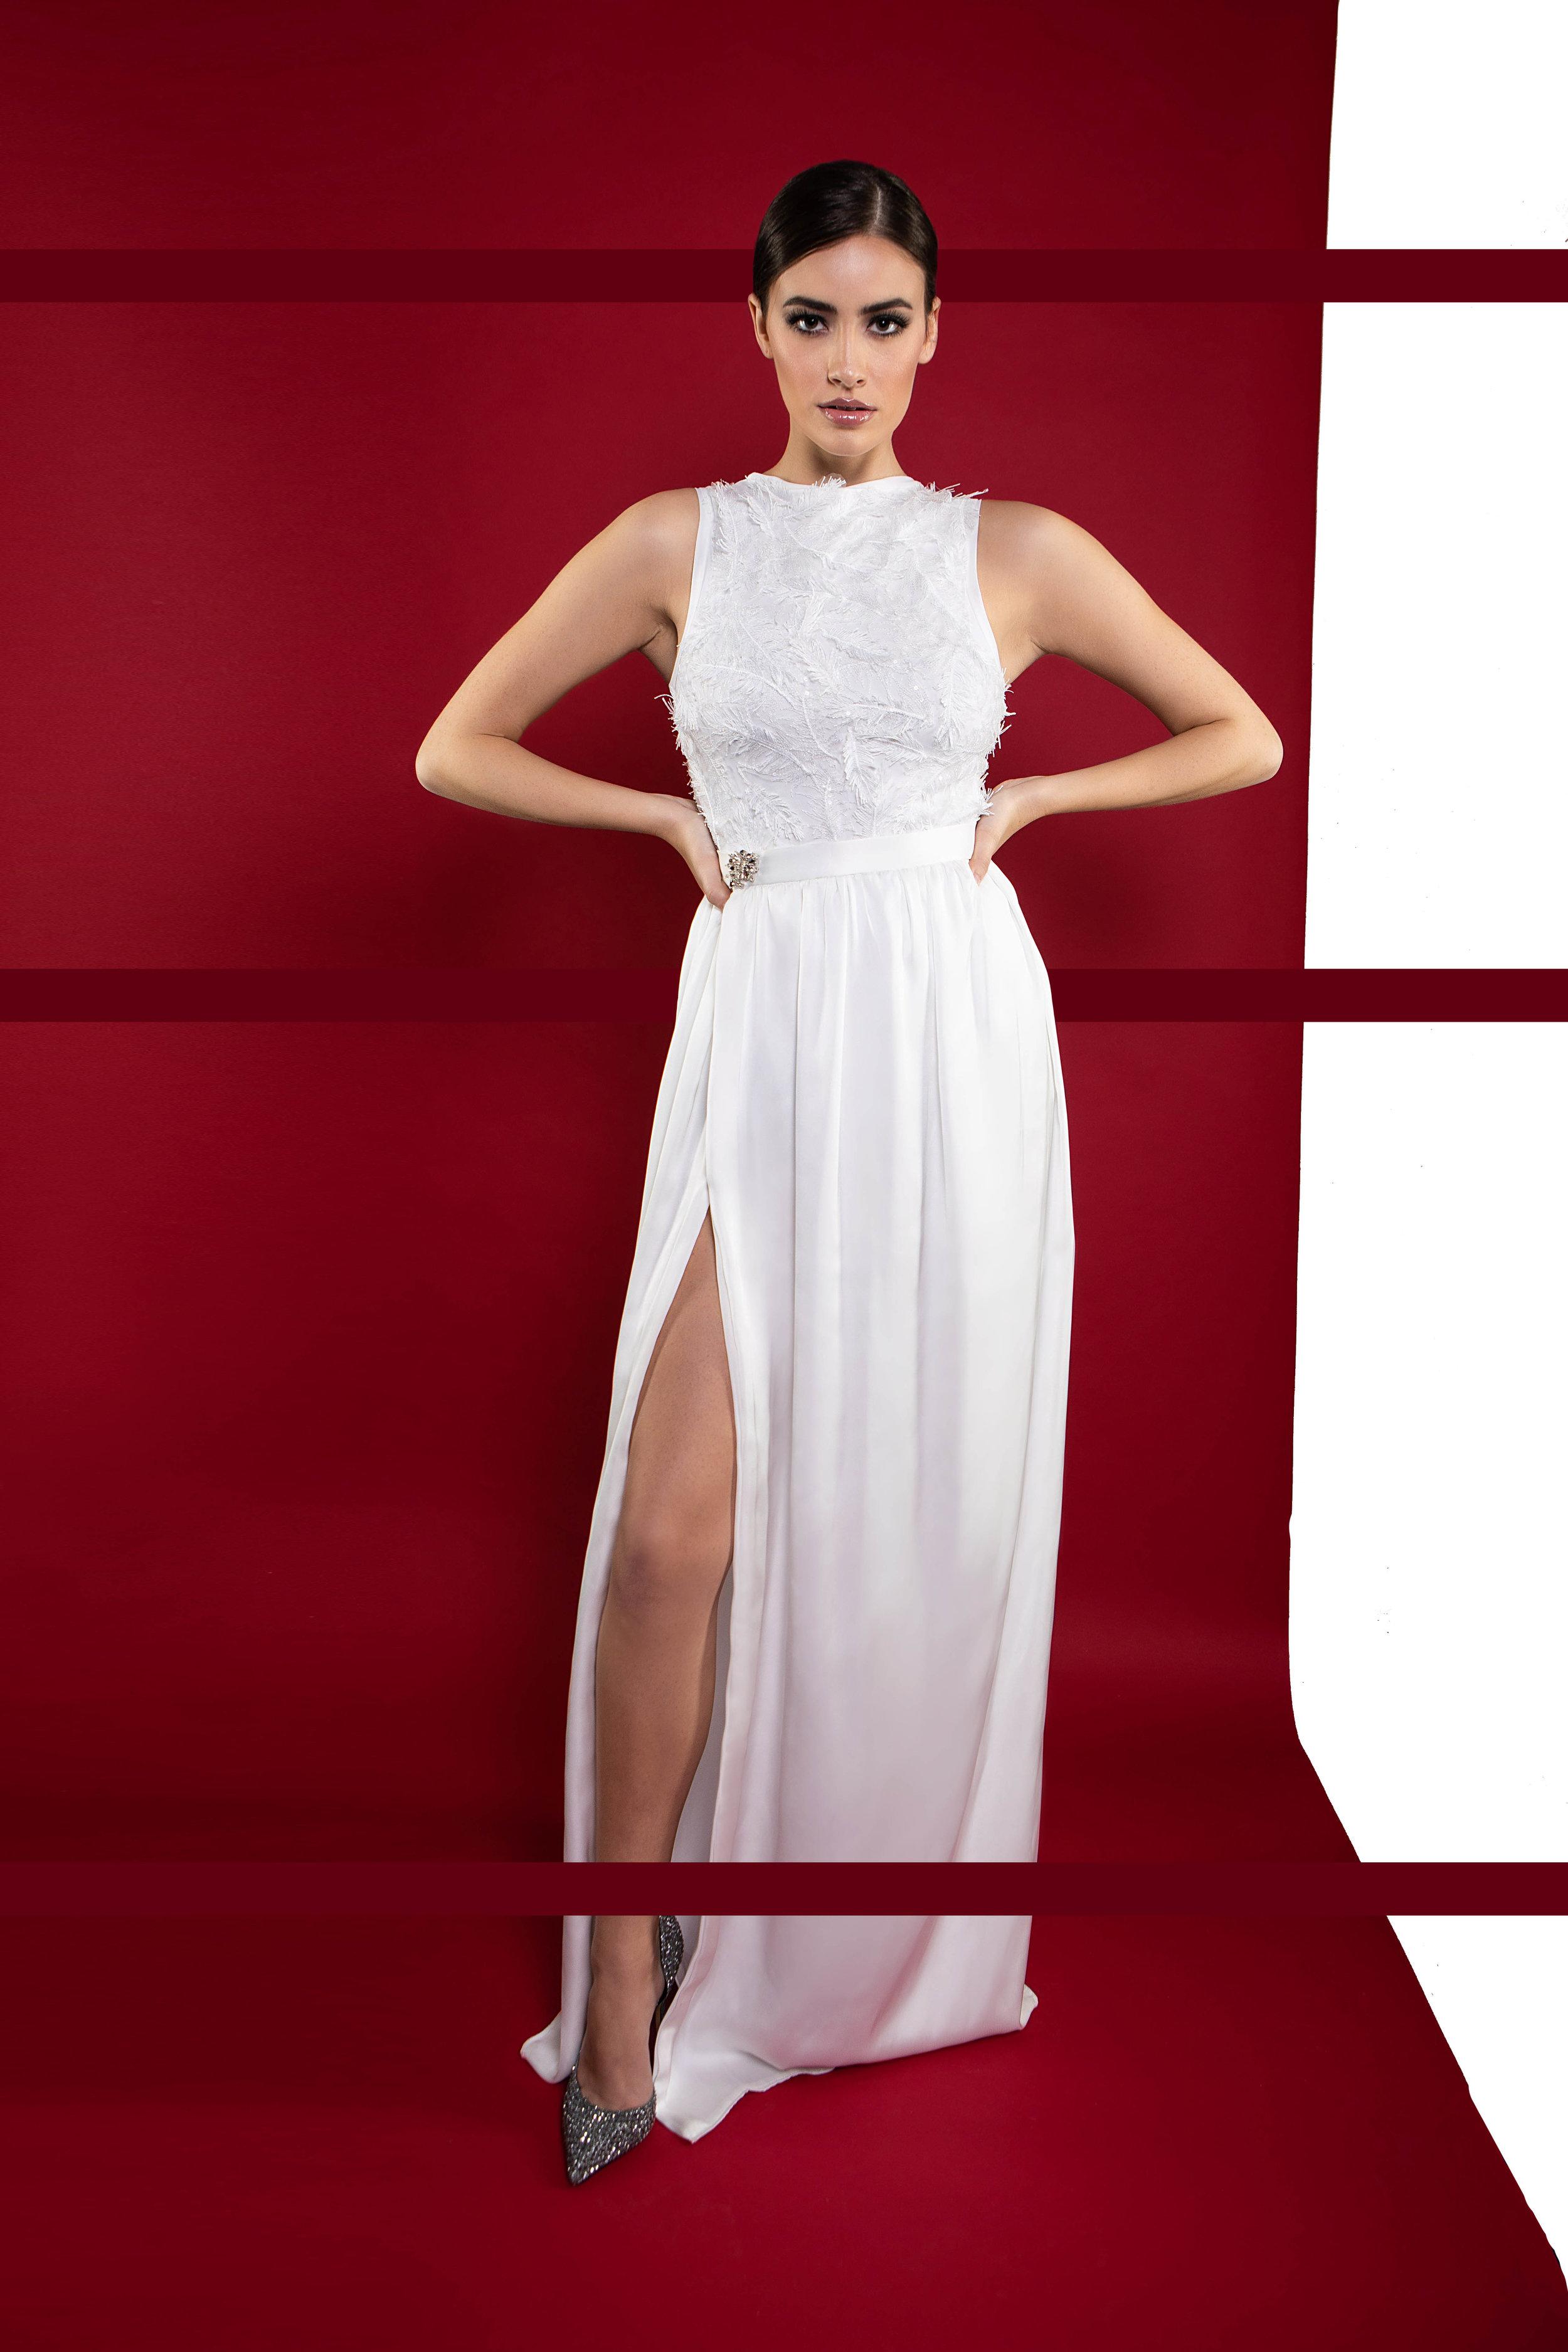 bridal_skirt_feathered_leotard_wedding_dress_tabitha_fielteau